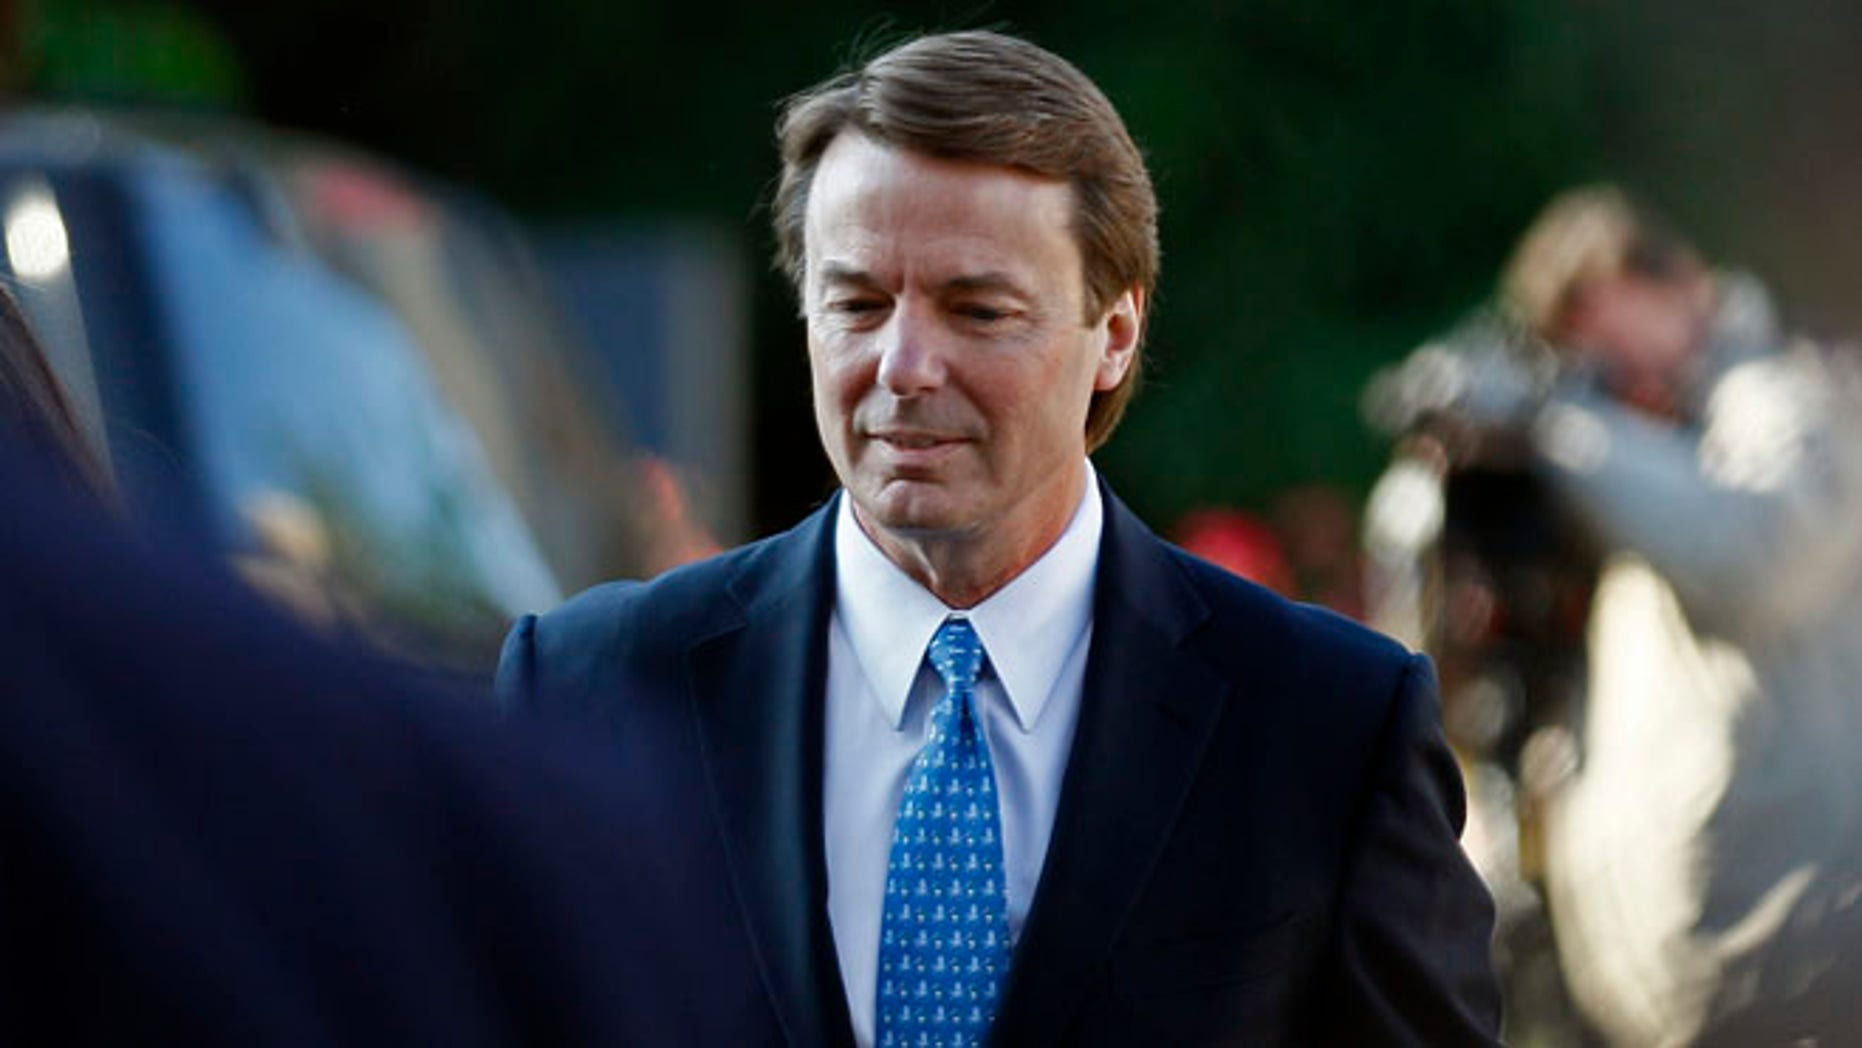 April 23, 2012: John Edwards arrives at federal court in Greensboro, N.C.